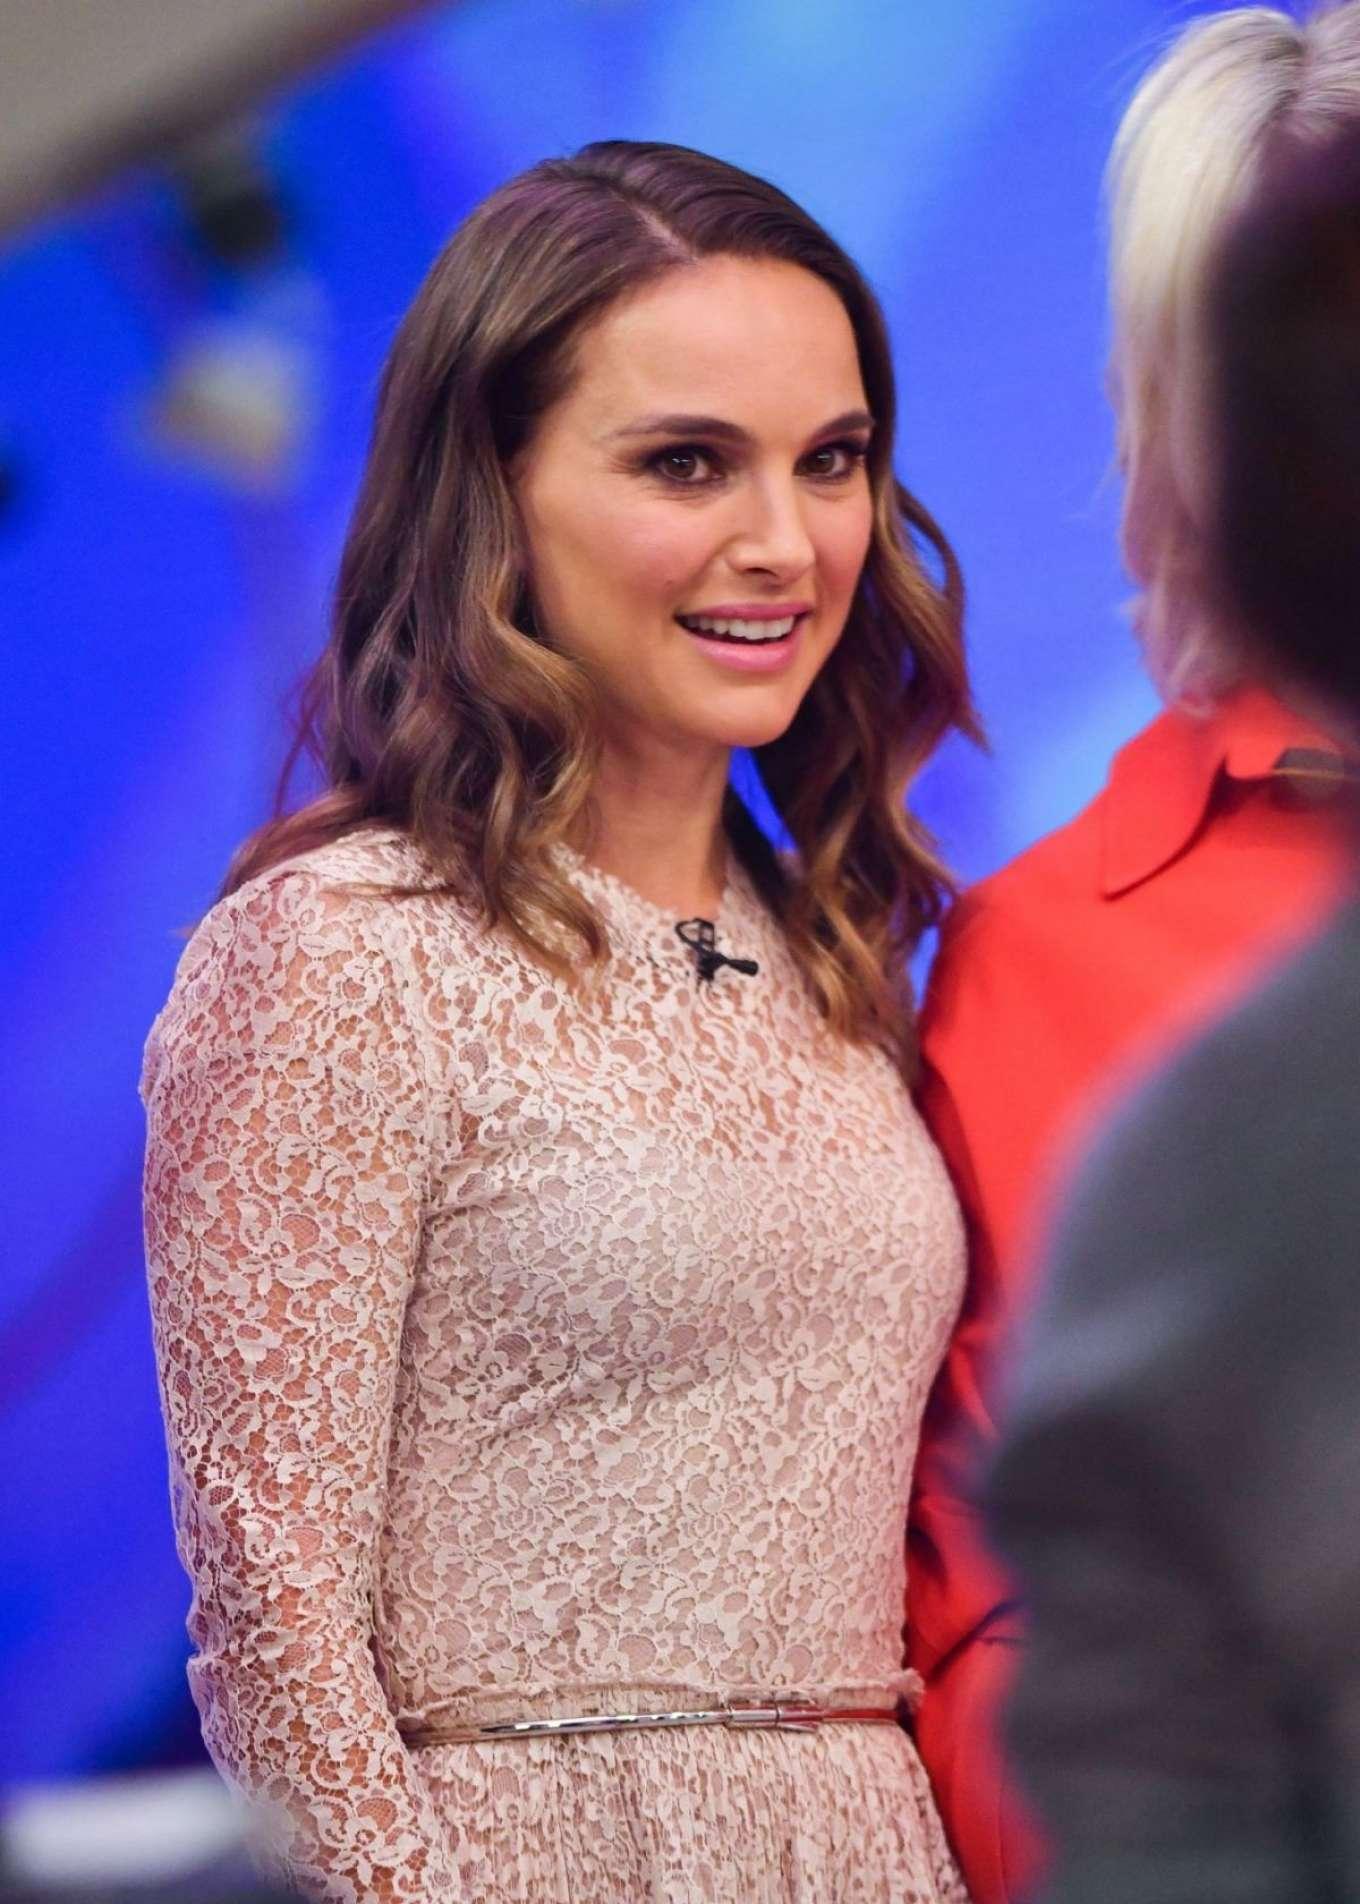 Natalie Portman 2018 : Natalie Portman: On Today Show -04